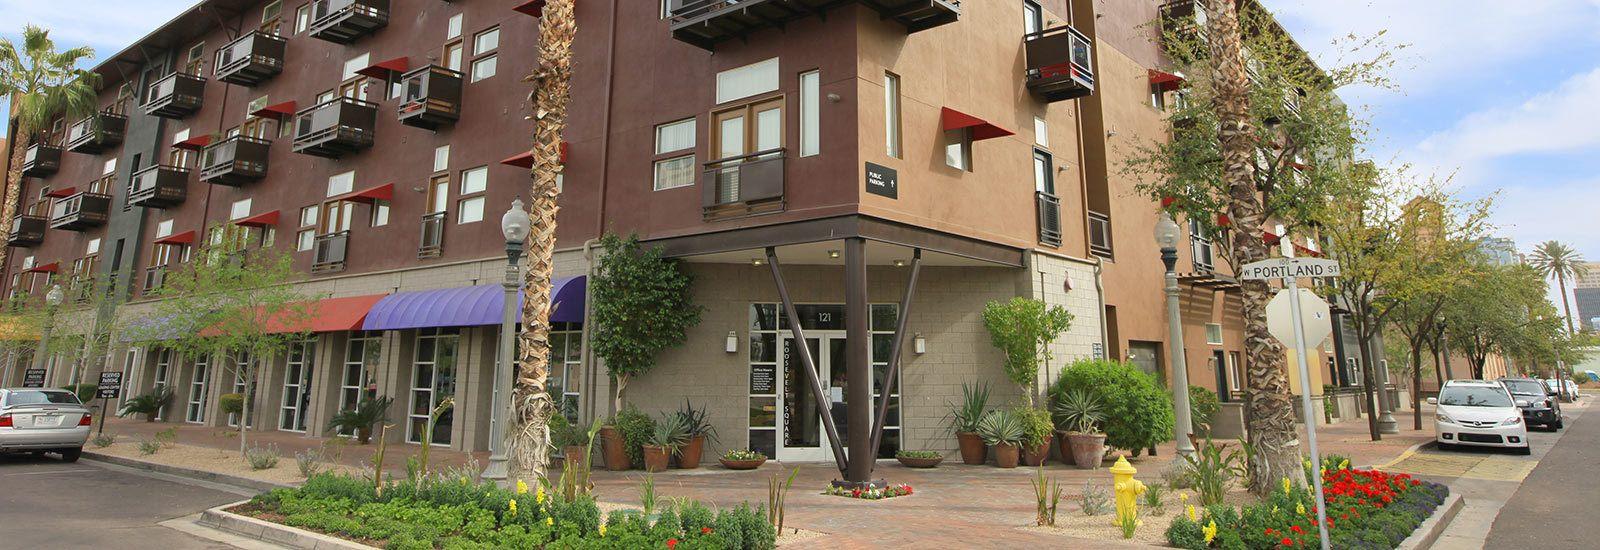 Apartments in Phoenix Arizona